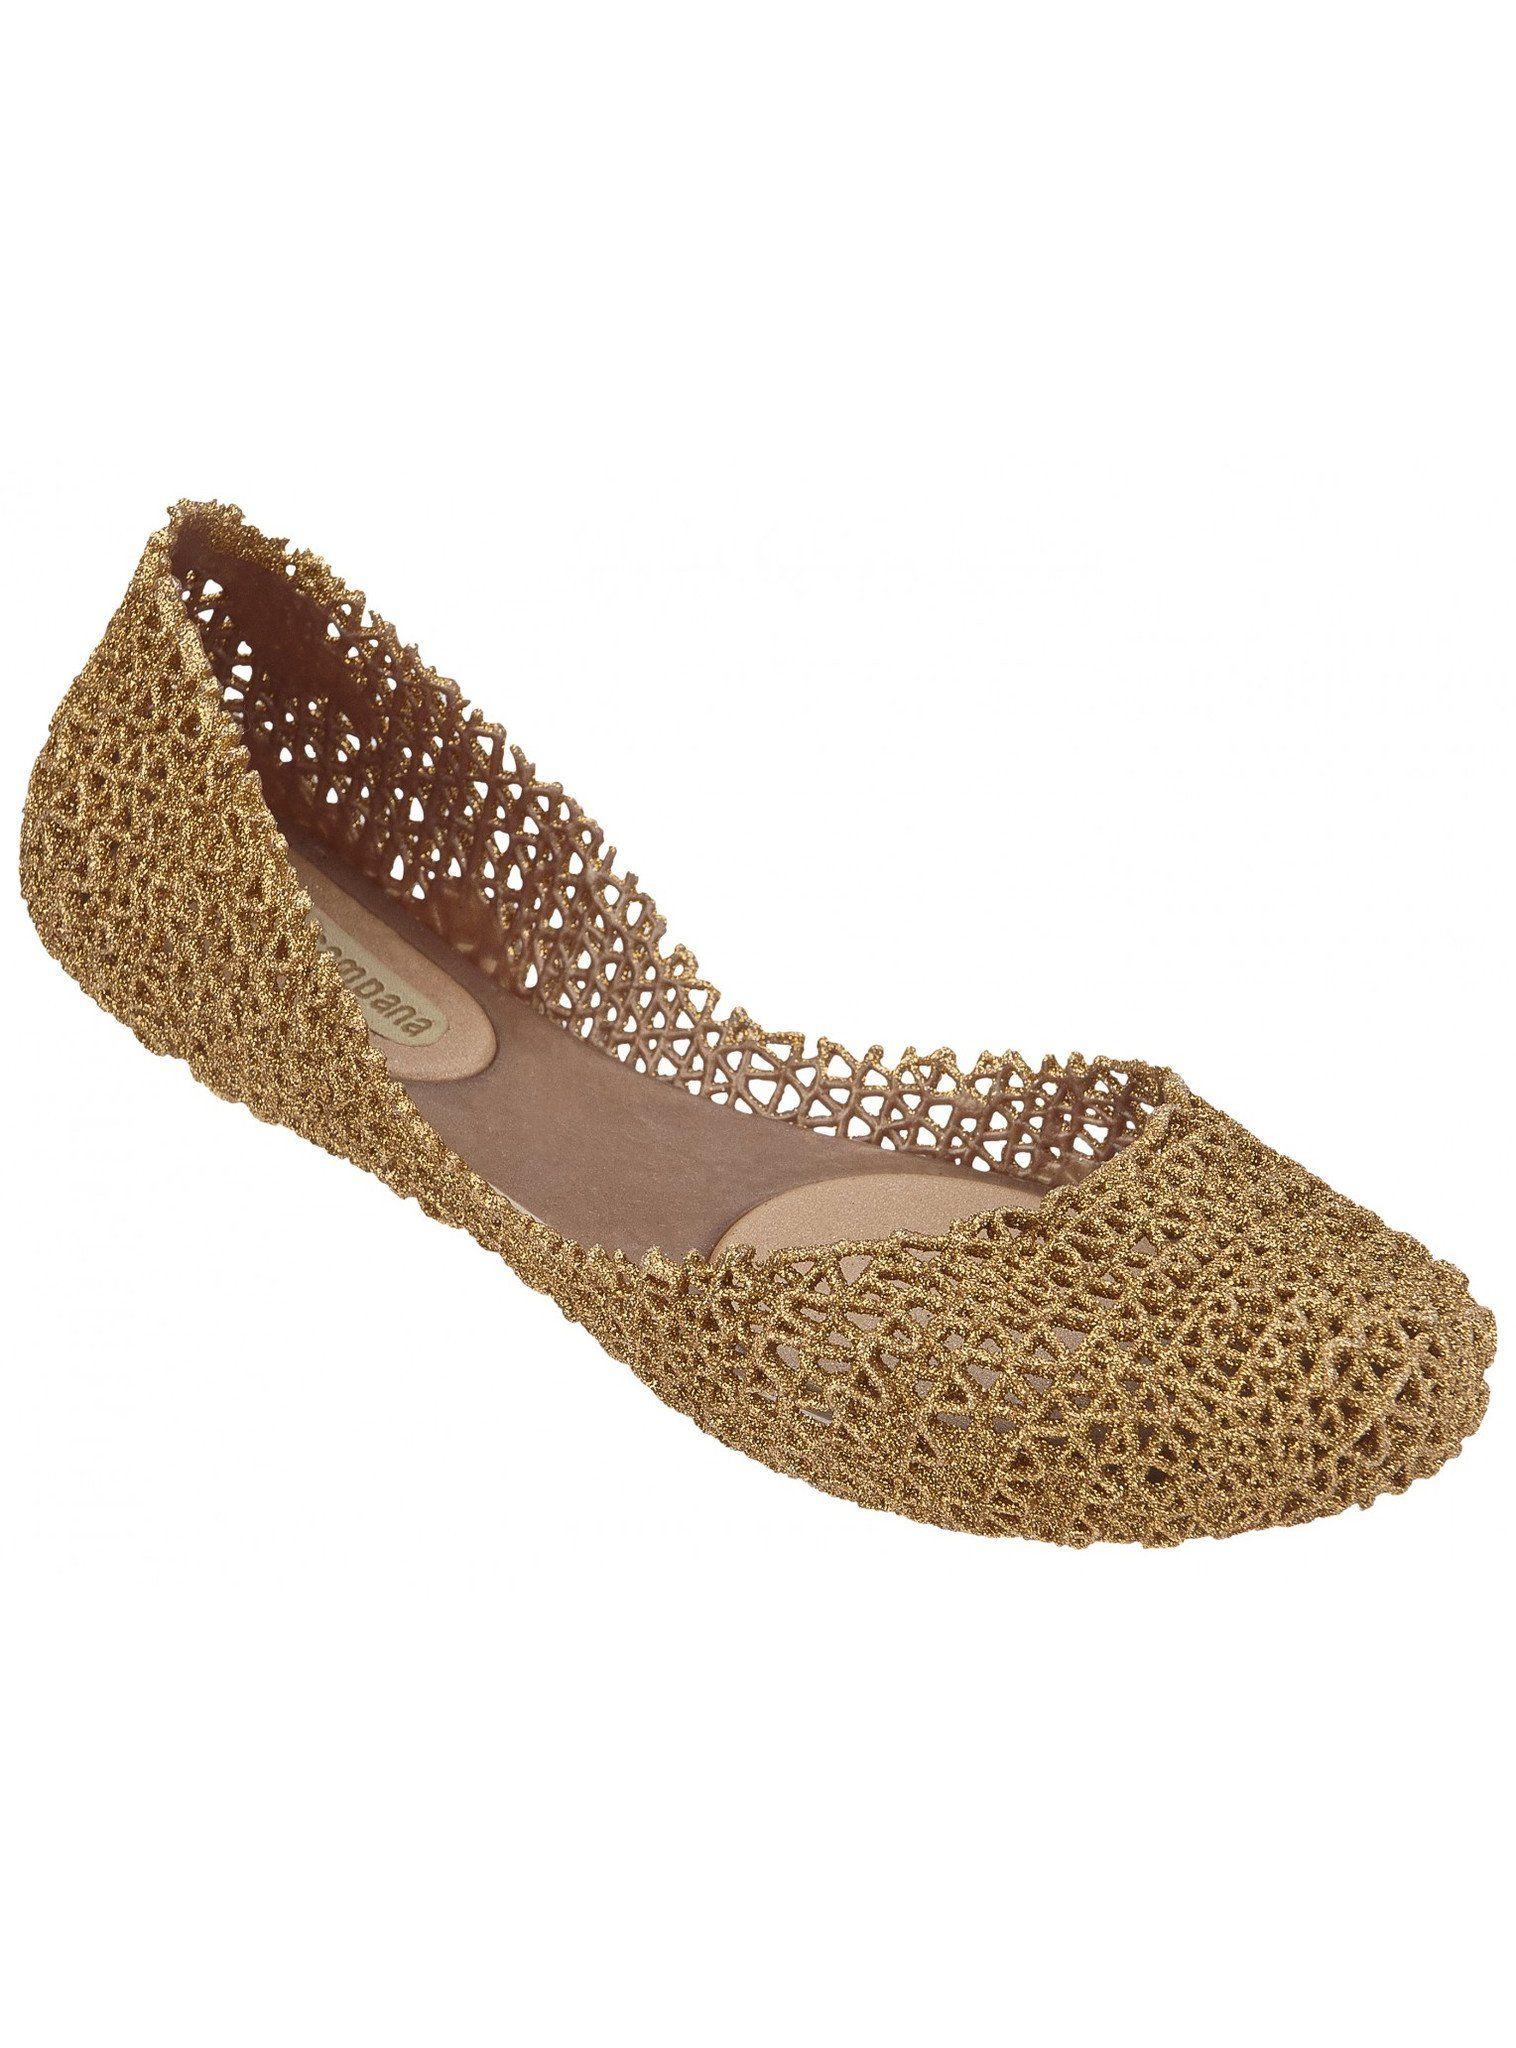 bbb9aeedce28 MELISSA Melissa Campana Zig Zag Ii.  melissa  shoes  flats